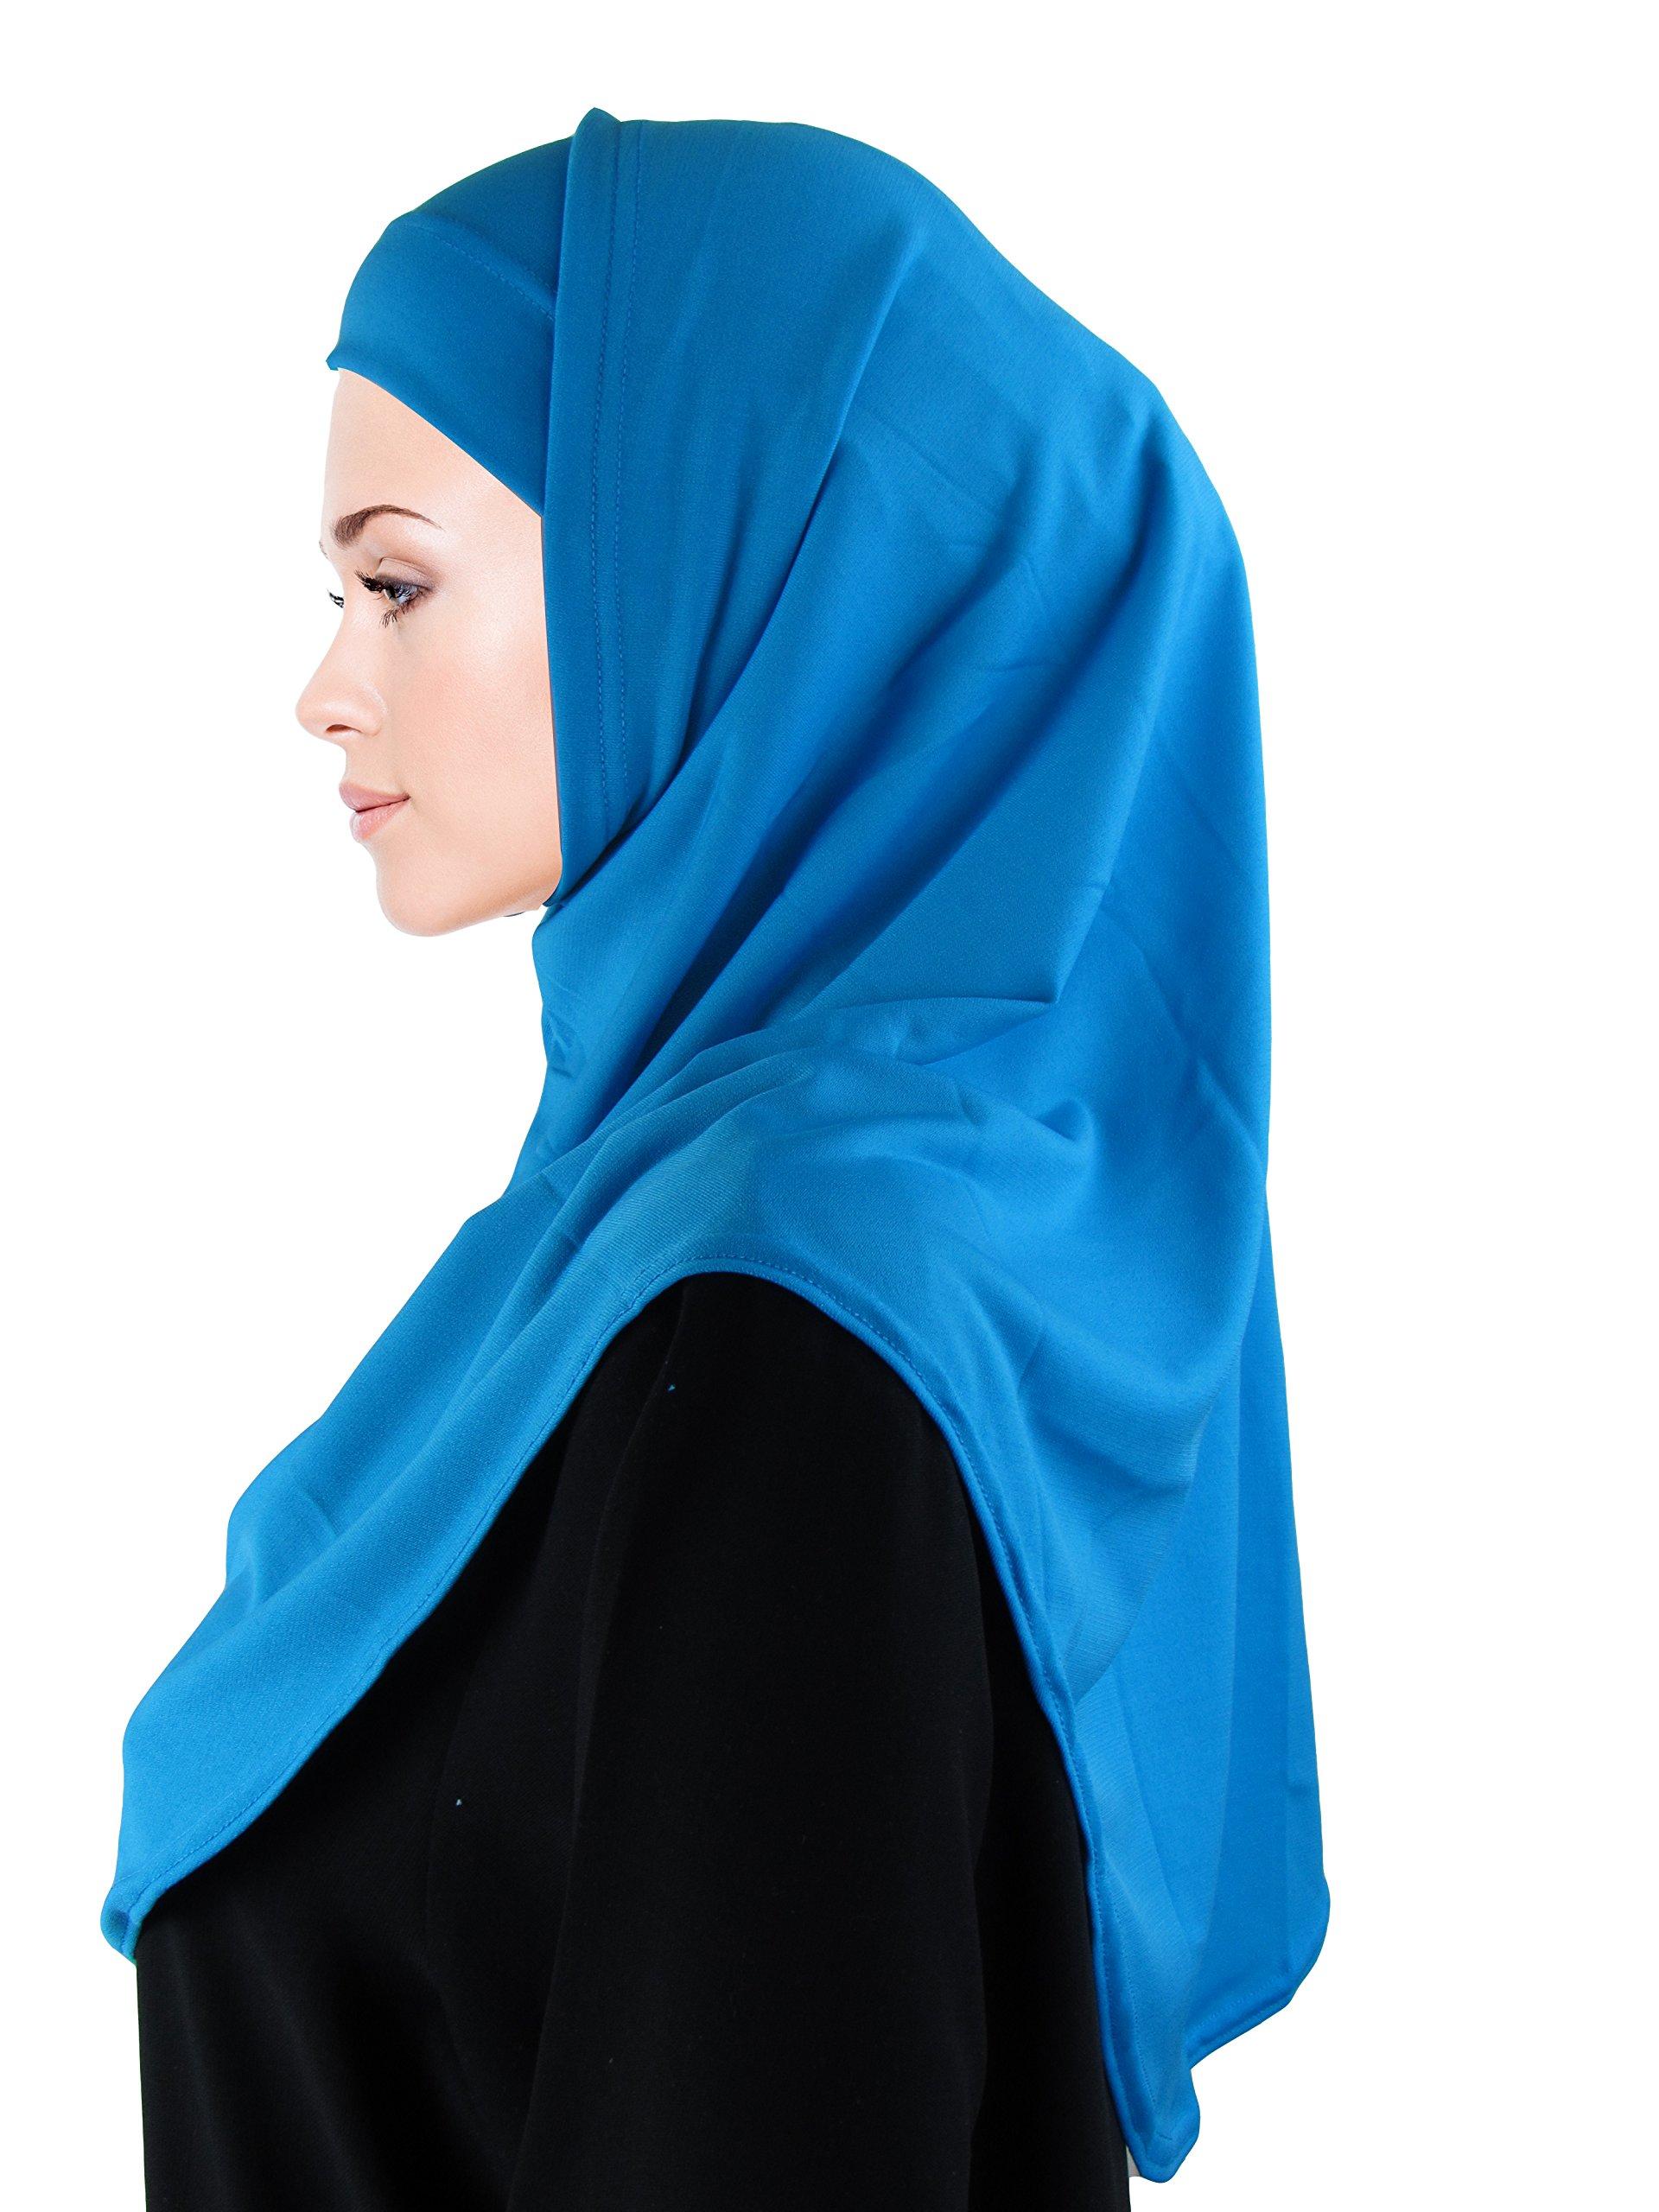 TheHijabStore Soft Polyester 2 Piece Al-Amira Princess Hijab-20 Colors